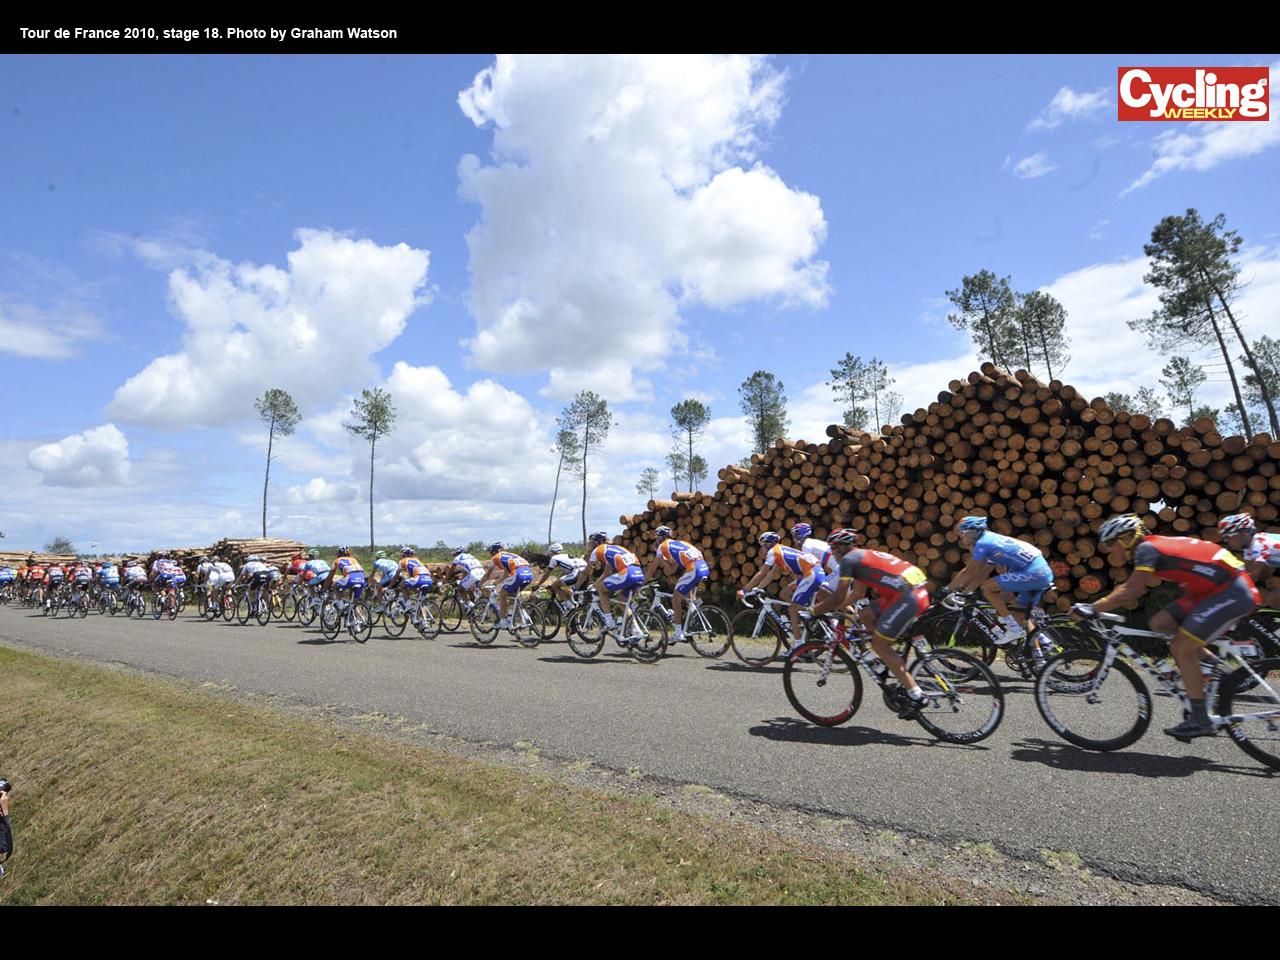 Tour de France 2010 wallpaper   Cycling Weekly 1280x960